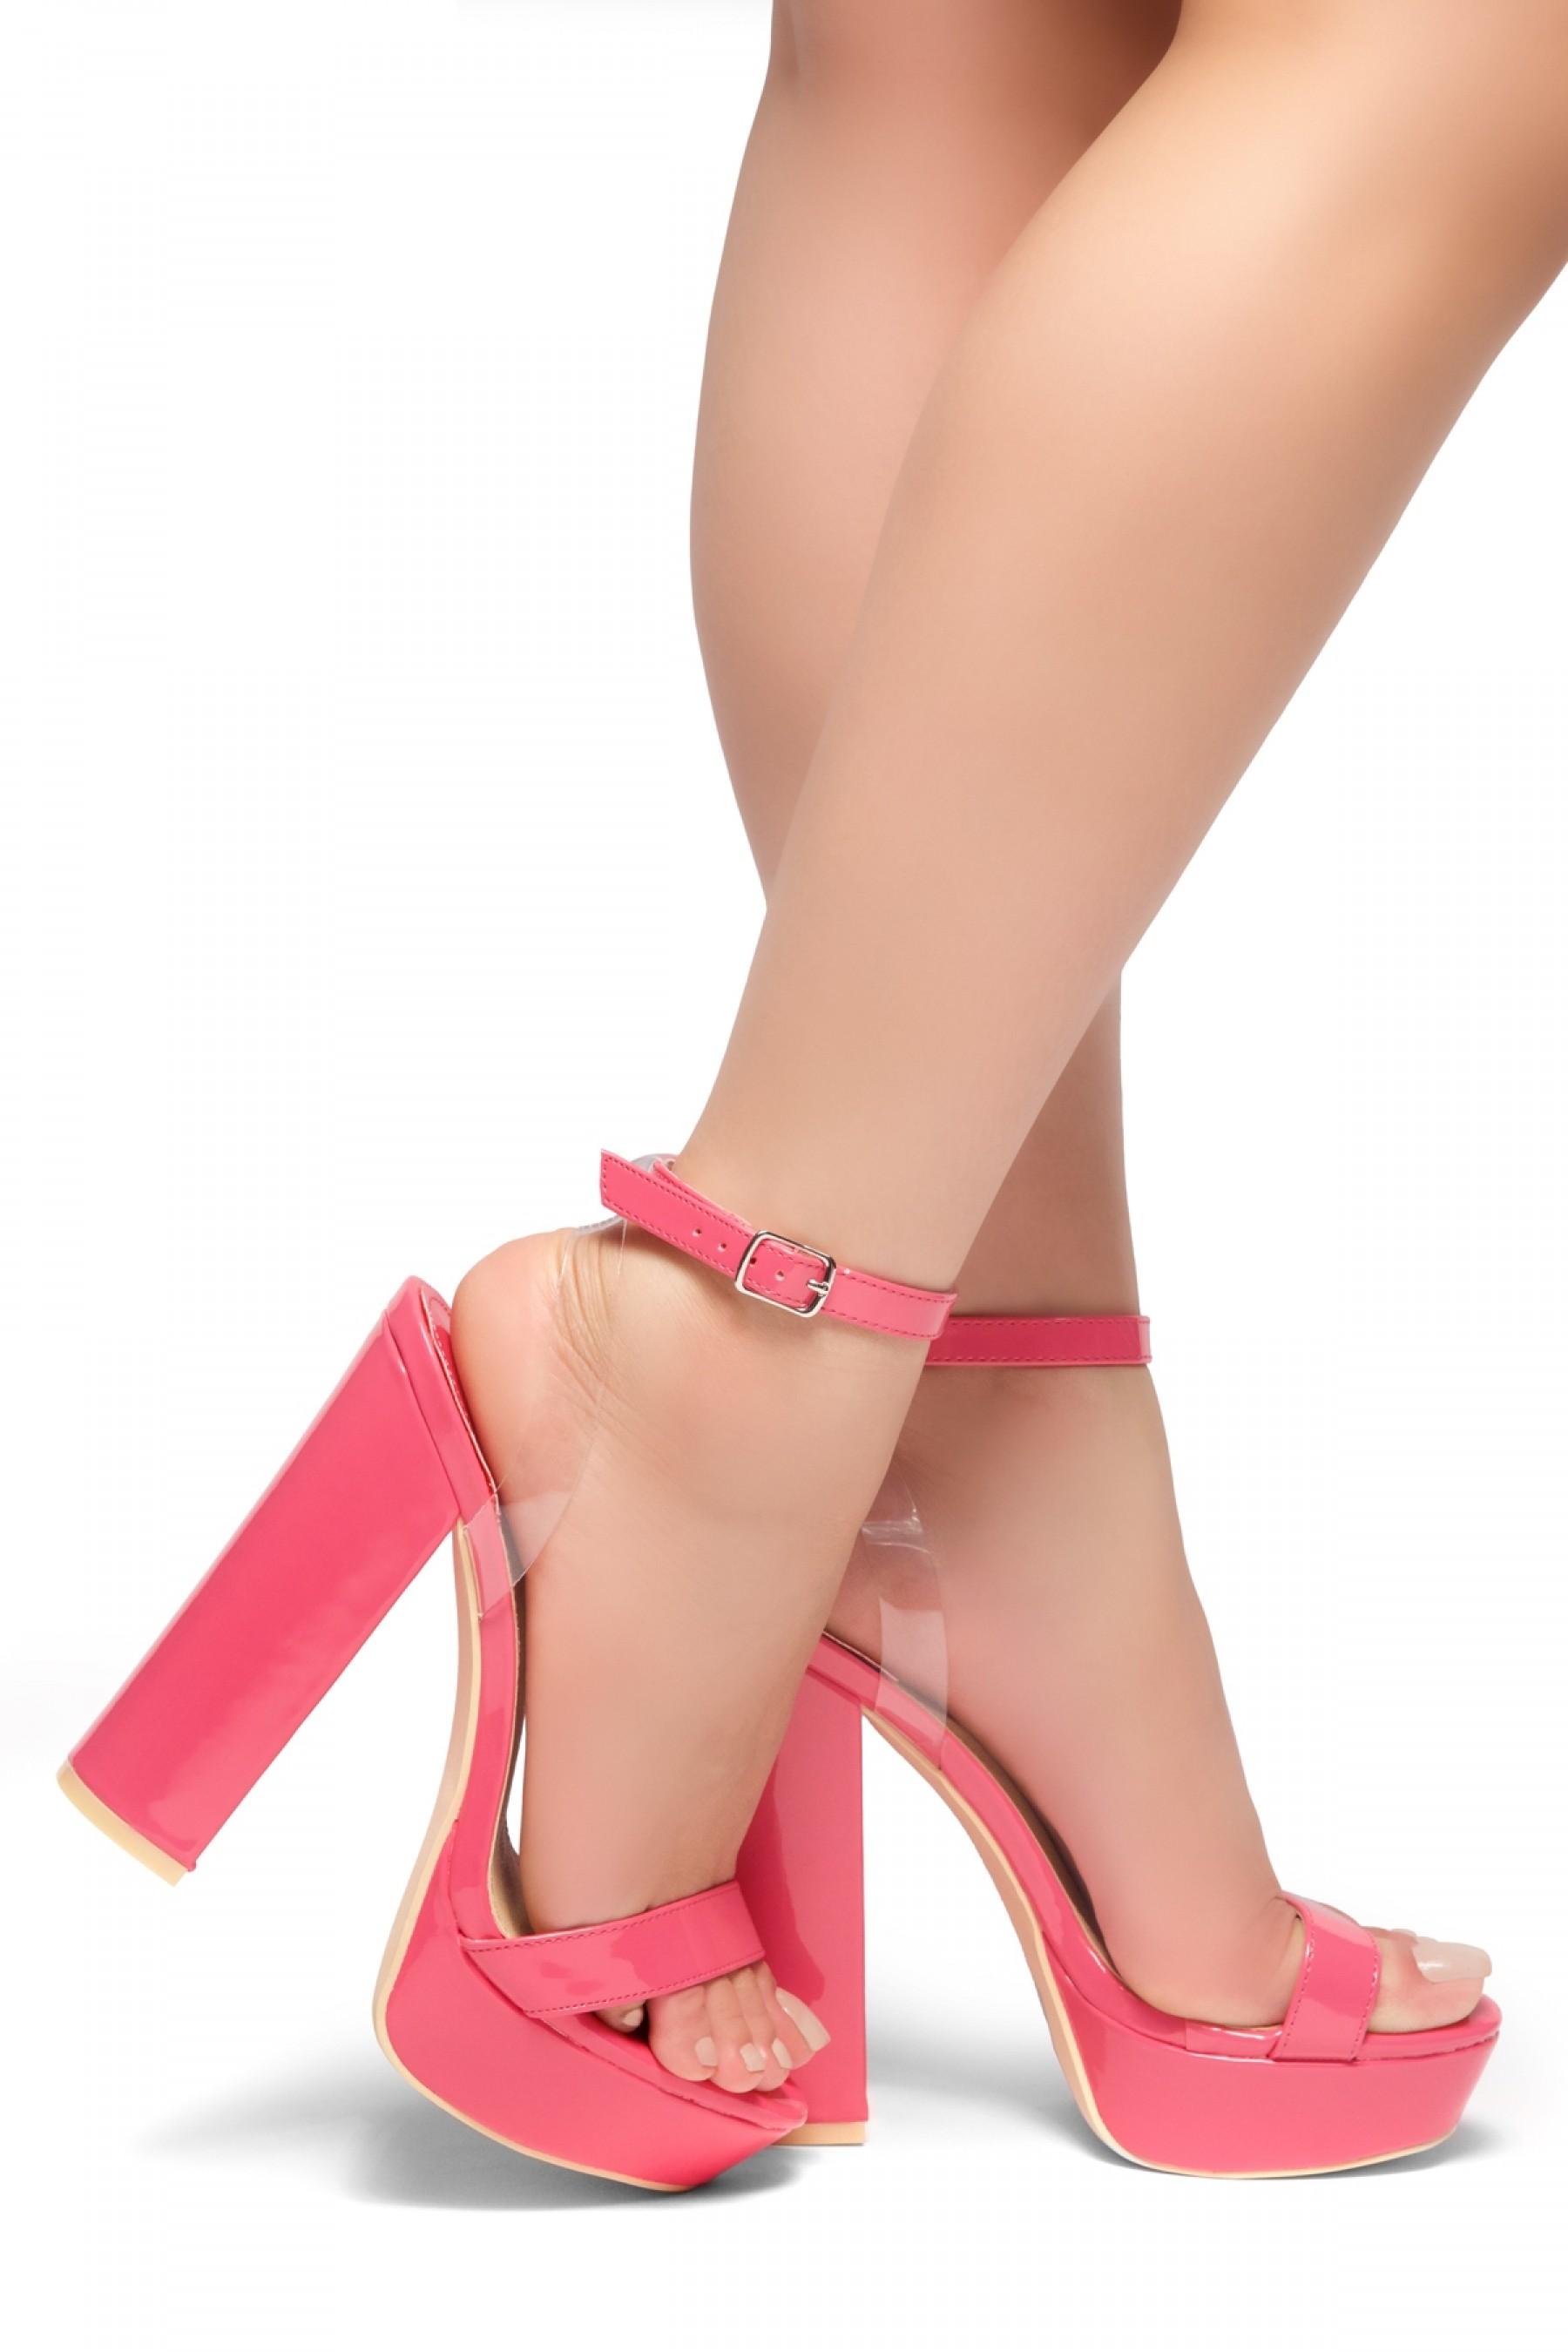 HerStyle MALIKA- Ankle Strap Platform Chunky Heel (Fuchsia)